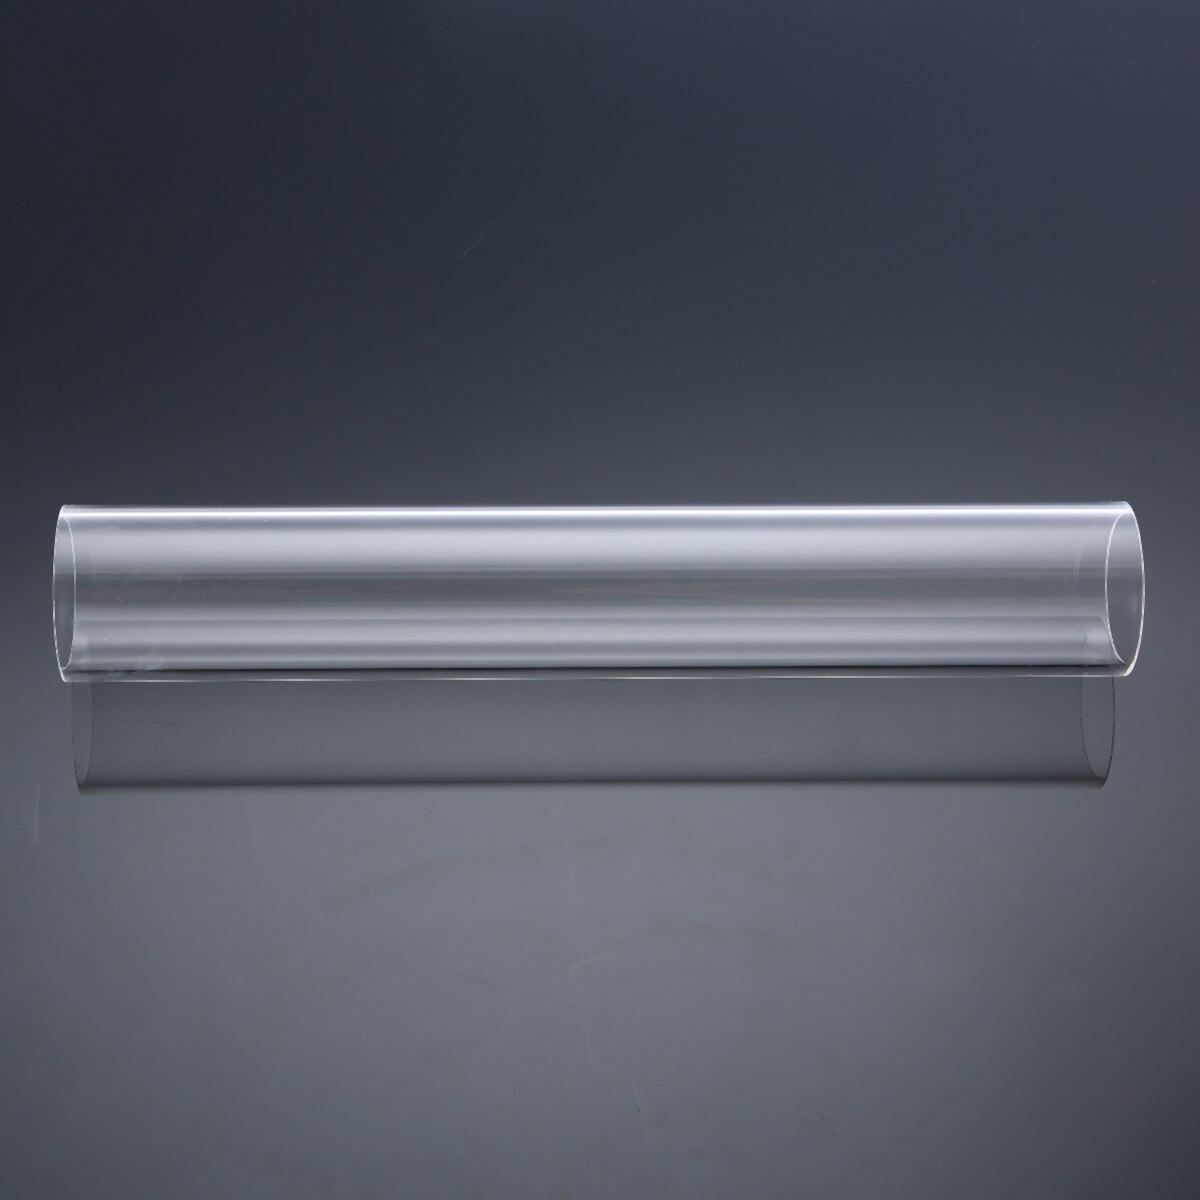 New 1Pcs Transparent Acrylic Plexiglass Lucite Tube 50mm OD 43.75mm ID 300mm Length Acrylic Tube DIY Tools 50 x3 x300mmNew 1Pcs Transparent Acrylic Plexiglass Lucite Tube 50mm OD 43.75mm ID 300mm Length Acrylic Tube DIY Tools 50 x3 x300mm